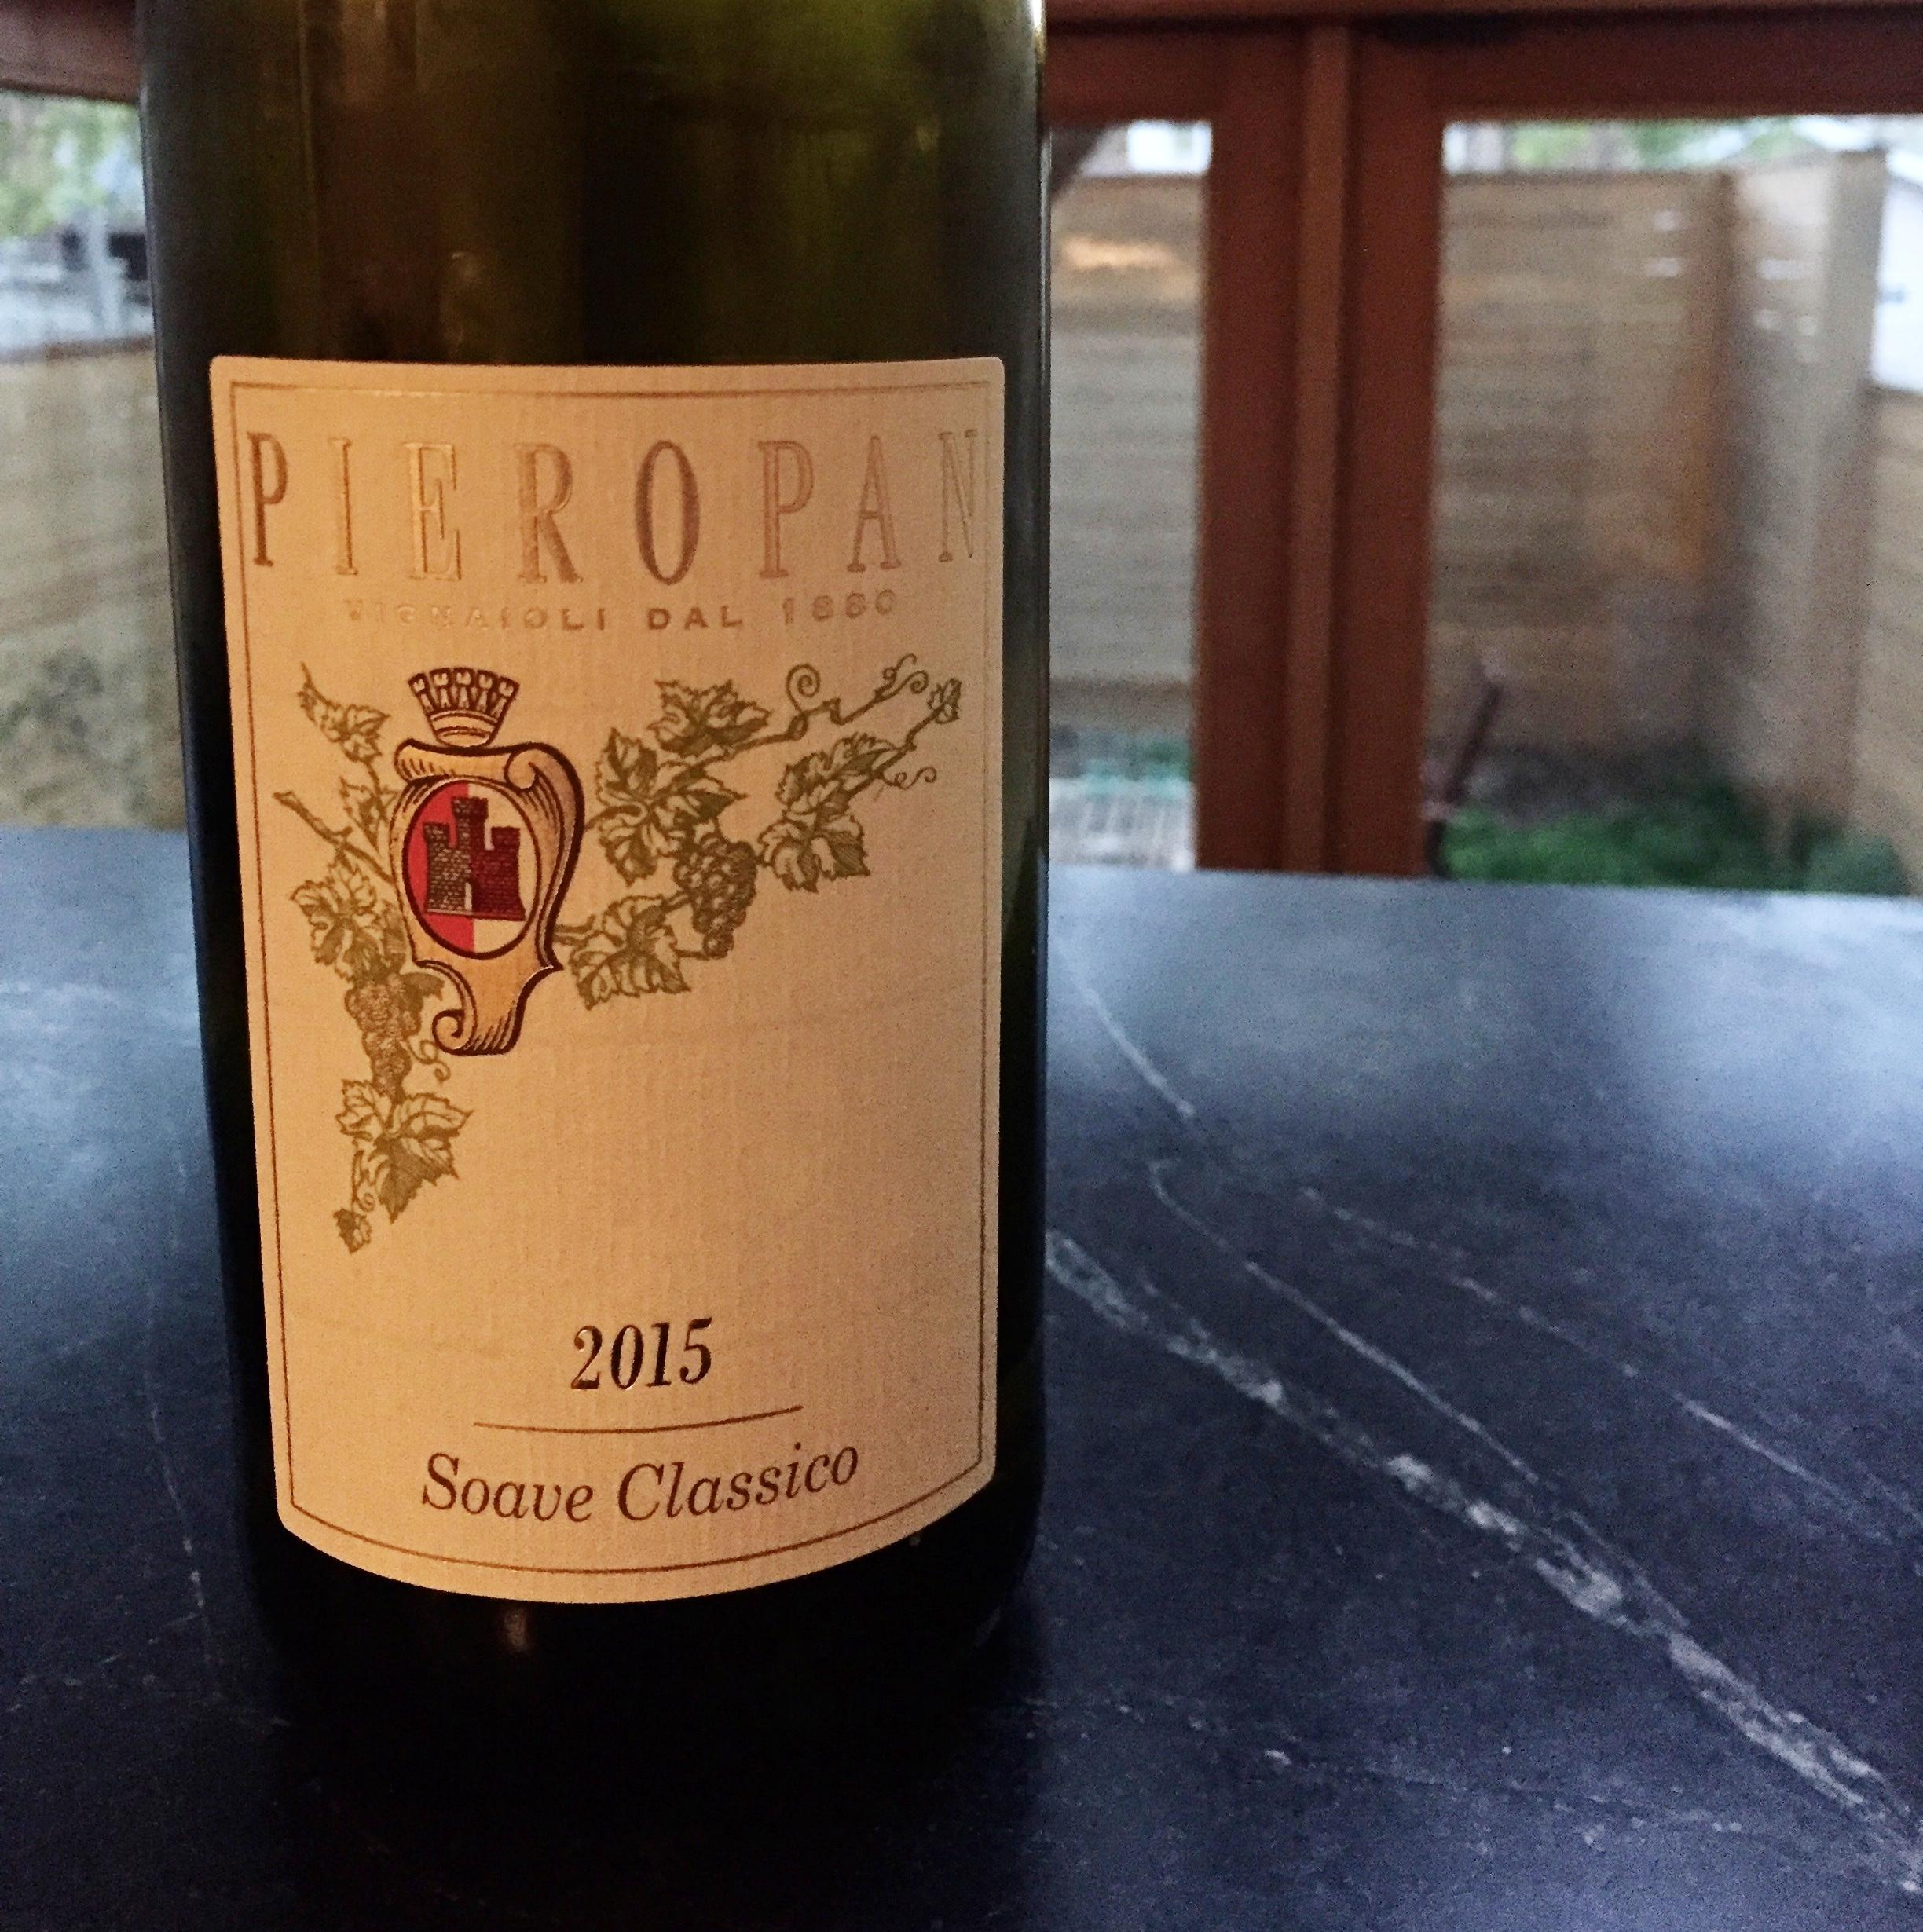 Pieropan Soave Classico 2015 Review